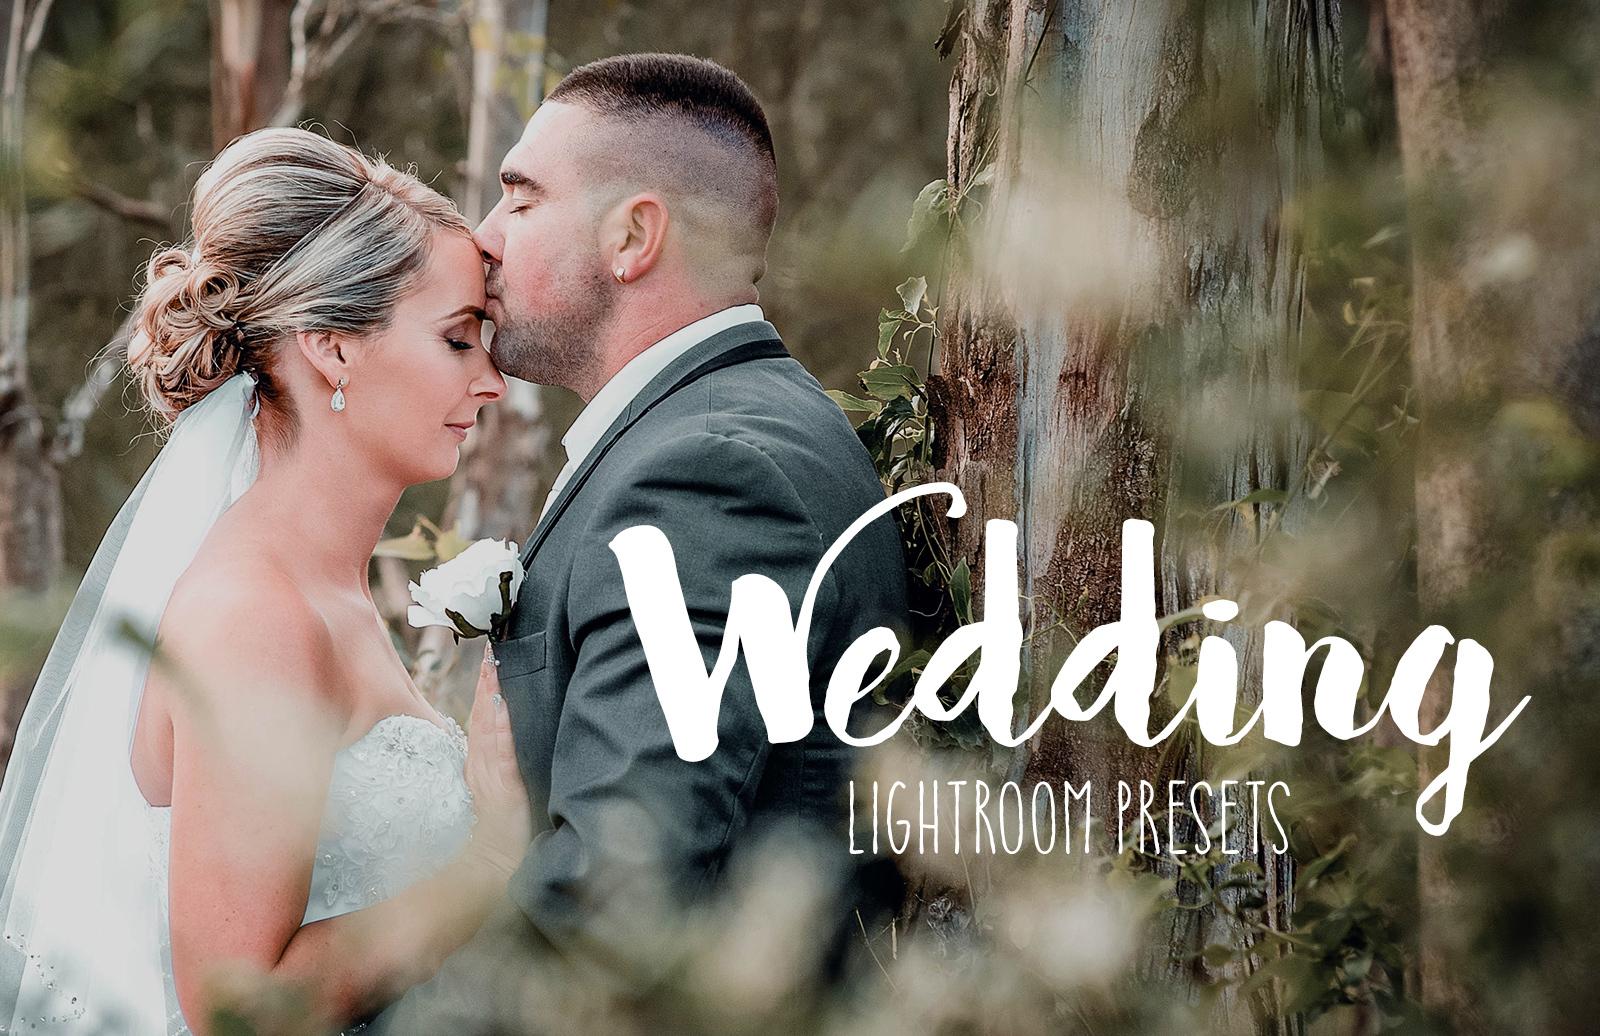 Wedding Lightroom Presets Preview 1